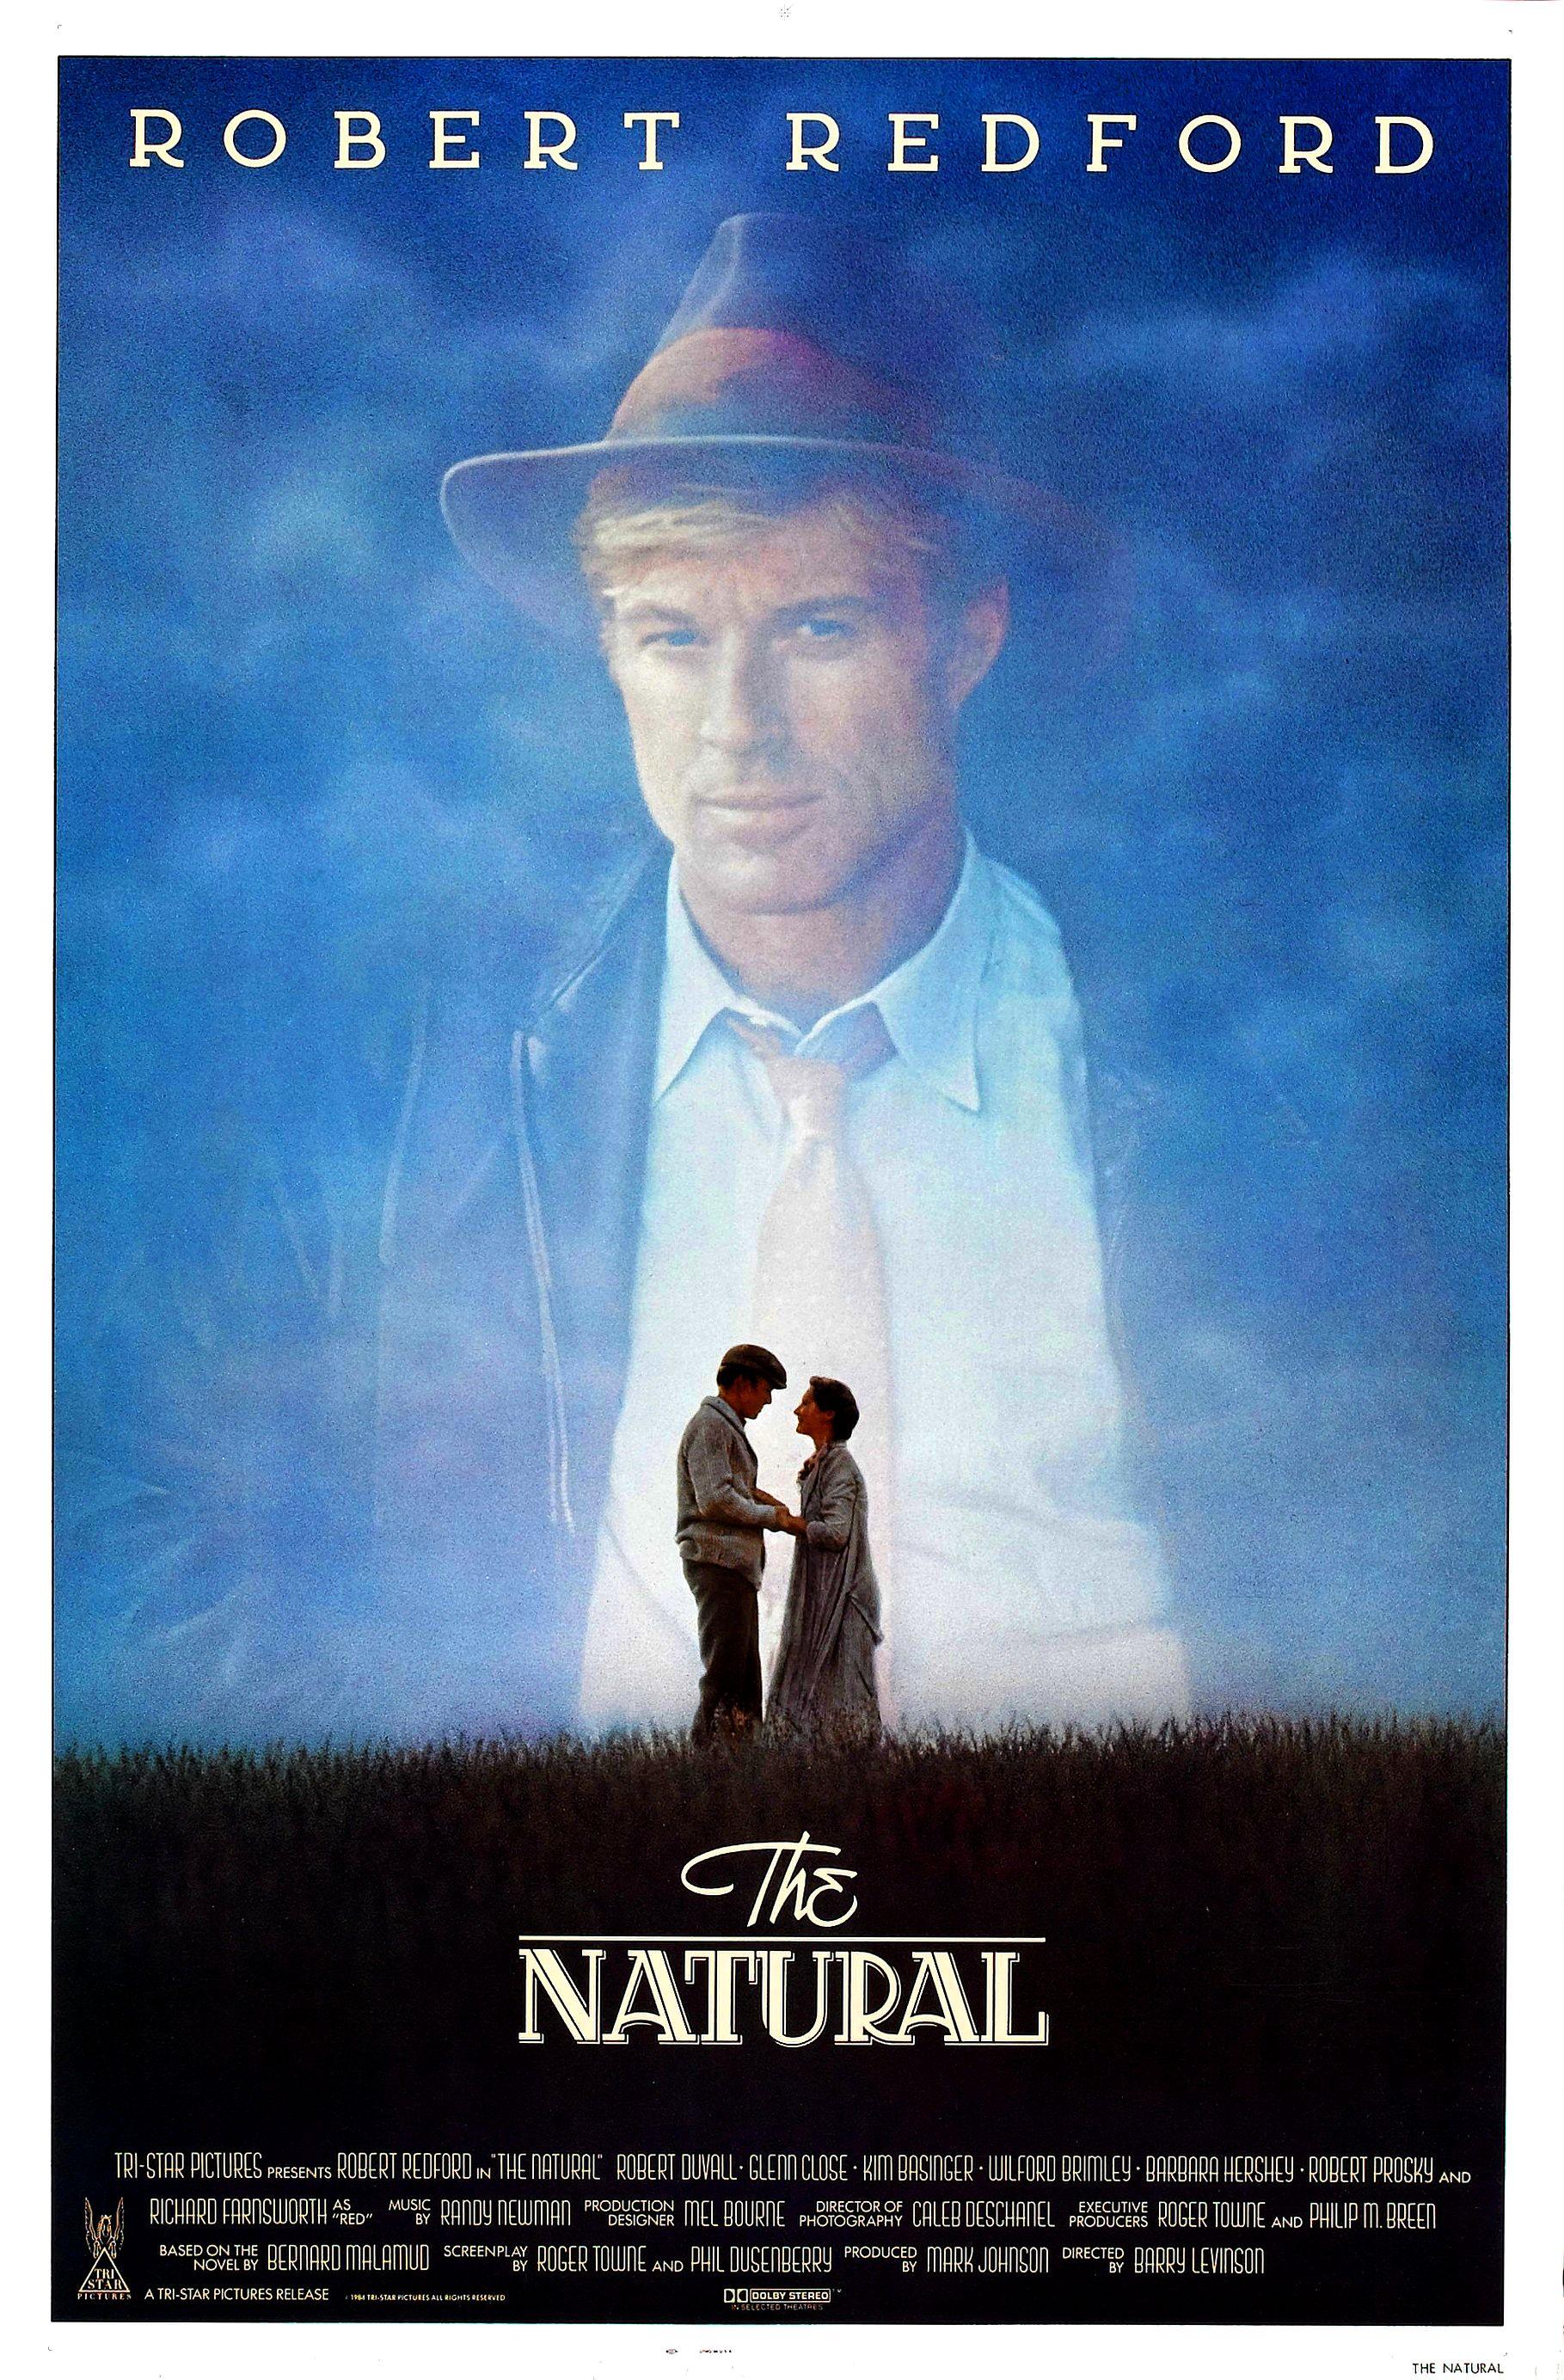 Pin By Brian Siegel On Robert Redford Movie Posters Robert Redford Robert Duvall